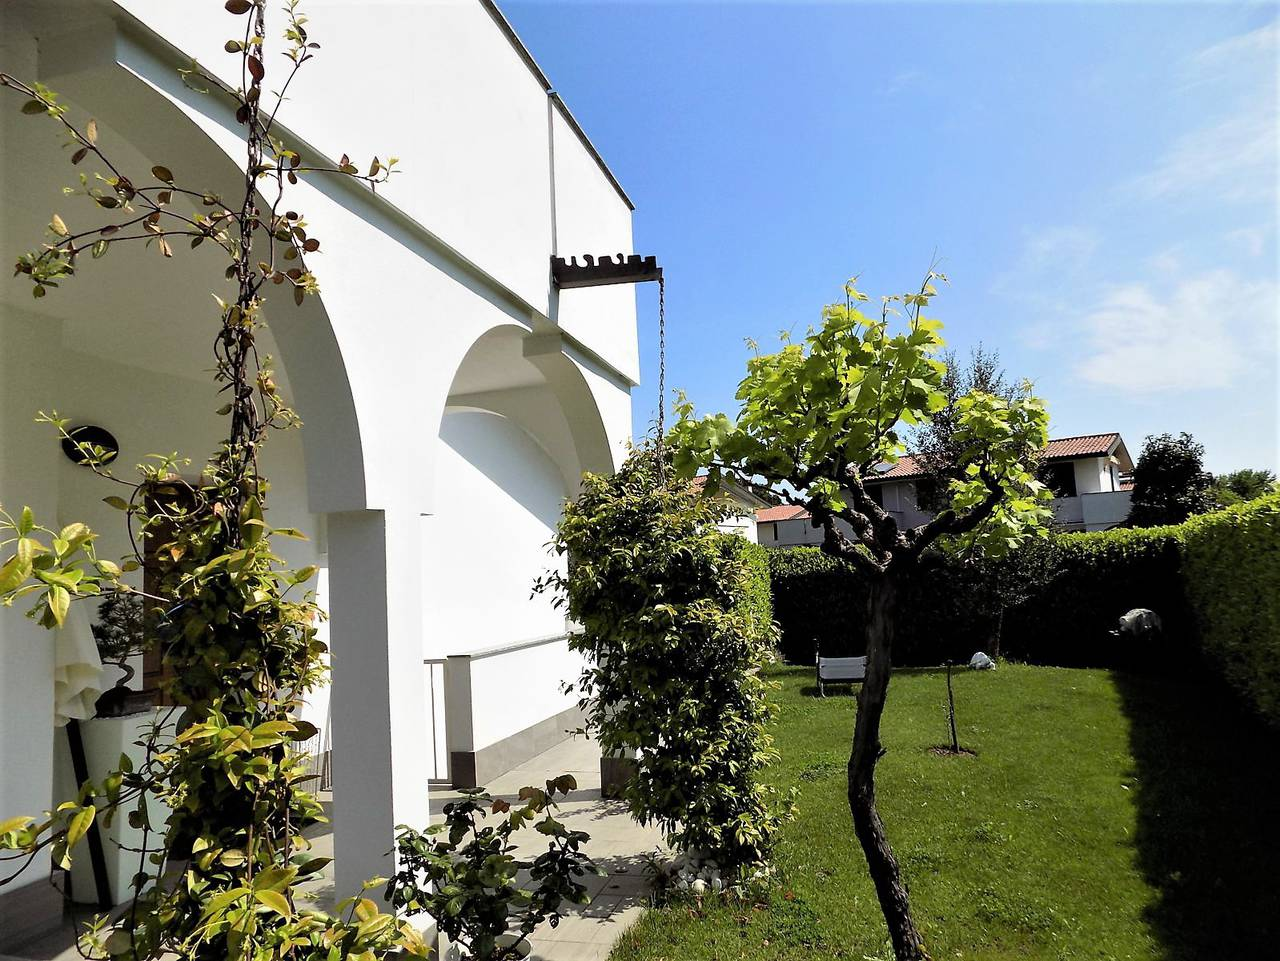 Porzione-villa-bifamigliare-ristrutturata-in-vendita-a-Carnate-25